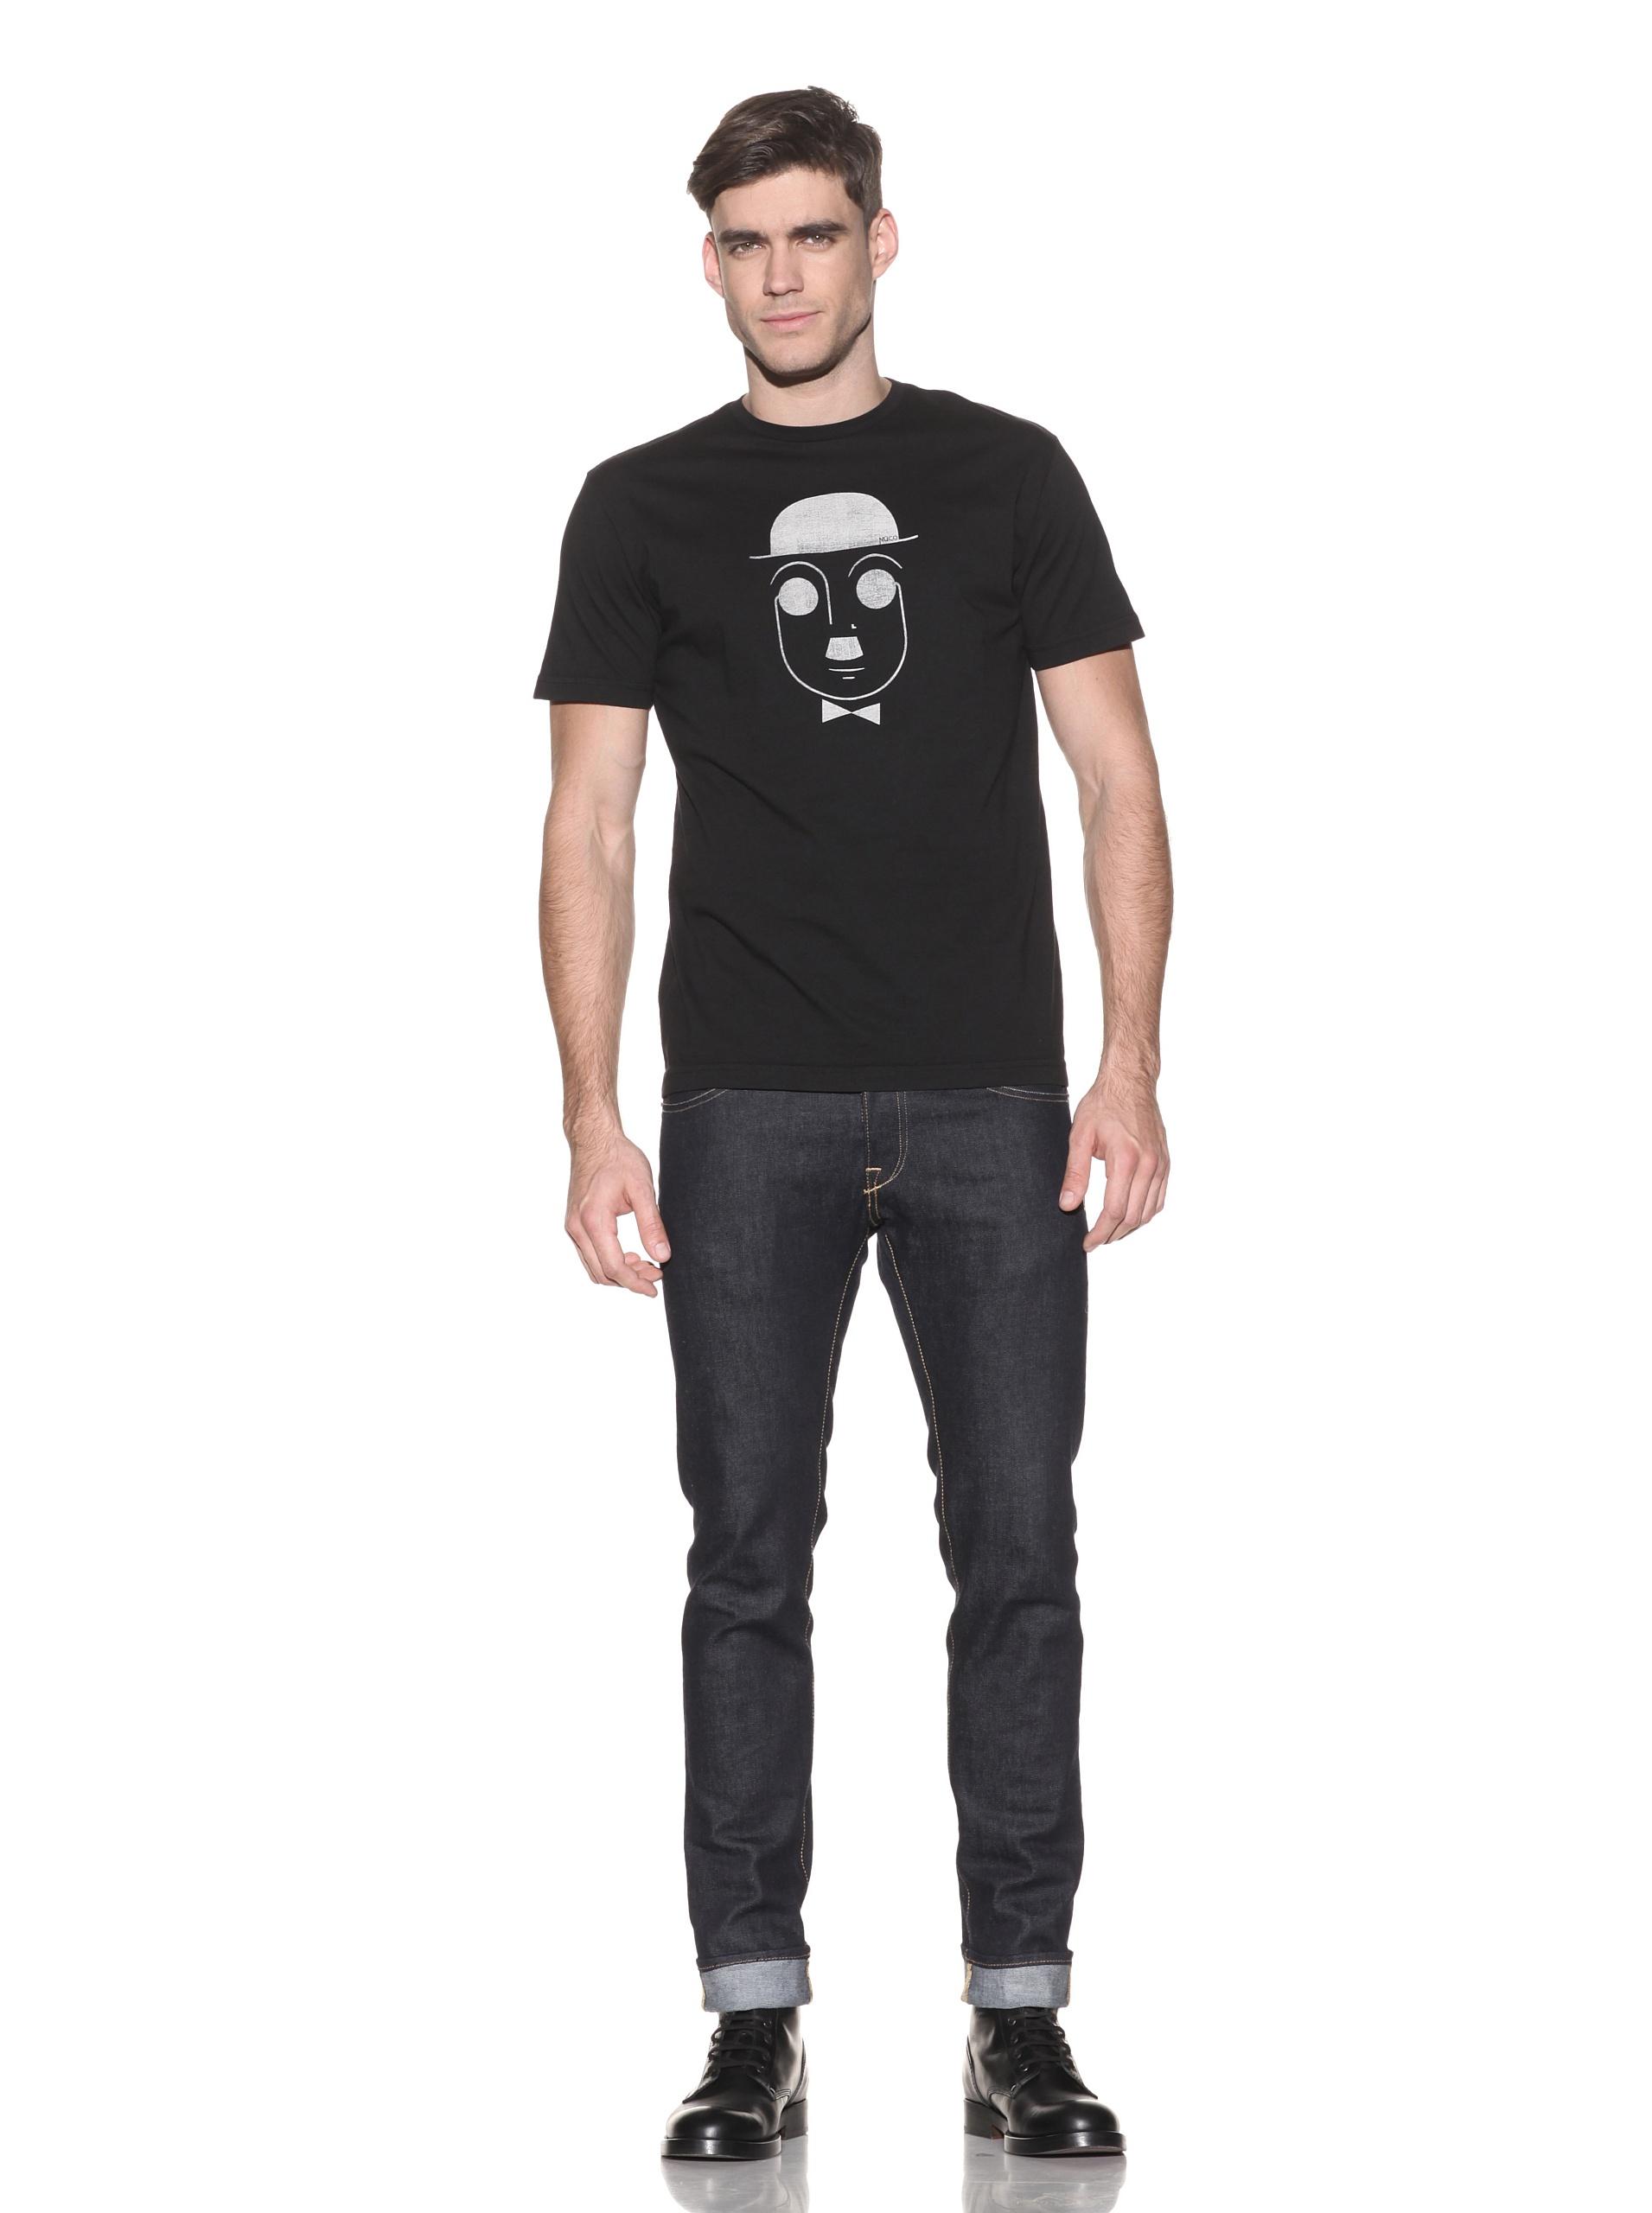 nüco Men's Bowler Graphic Tee (Black)